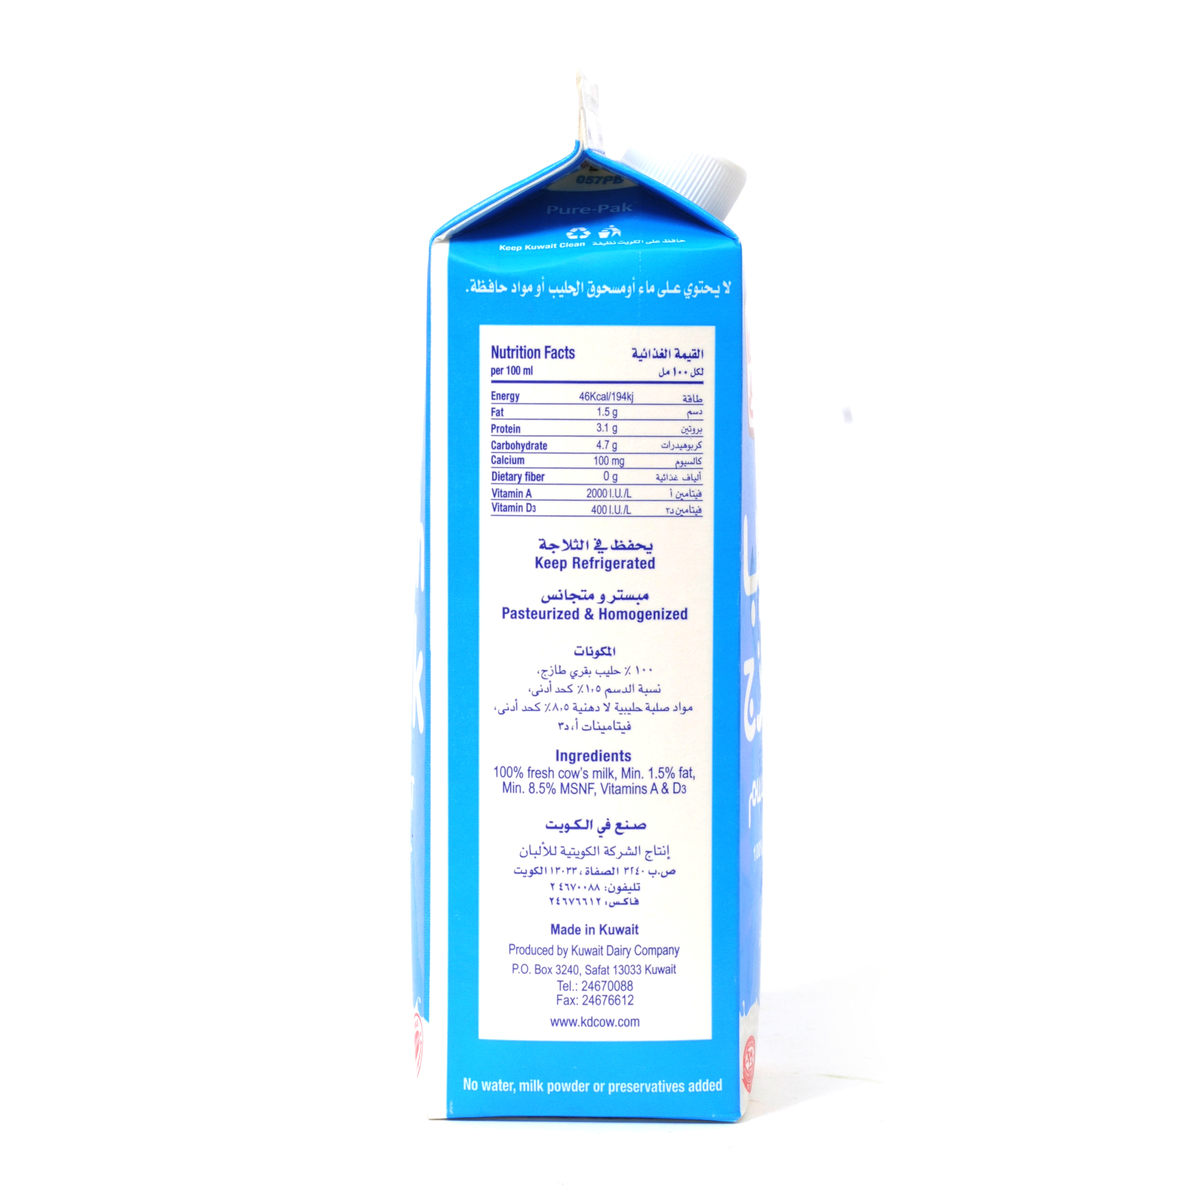 Kuwait Dairy Company